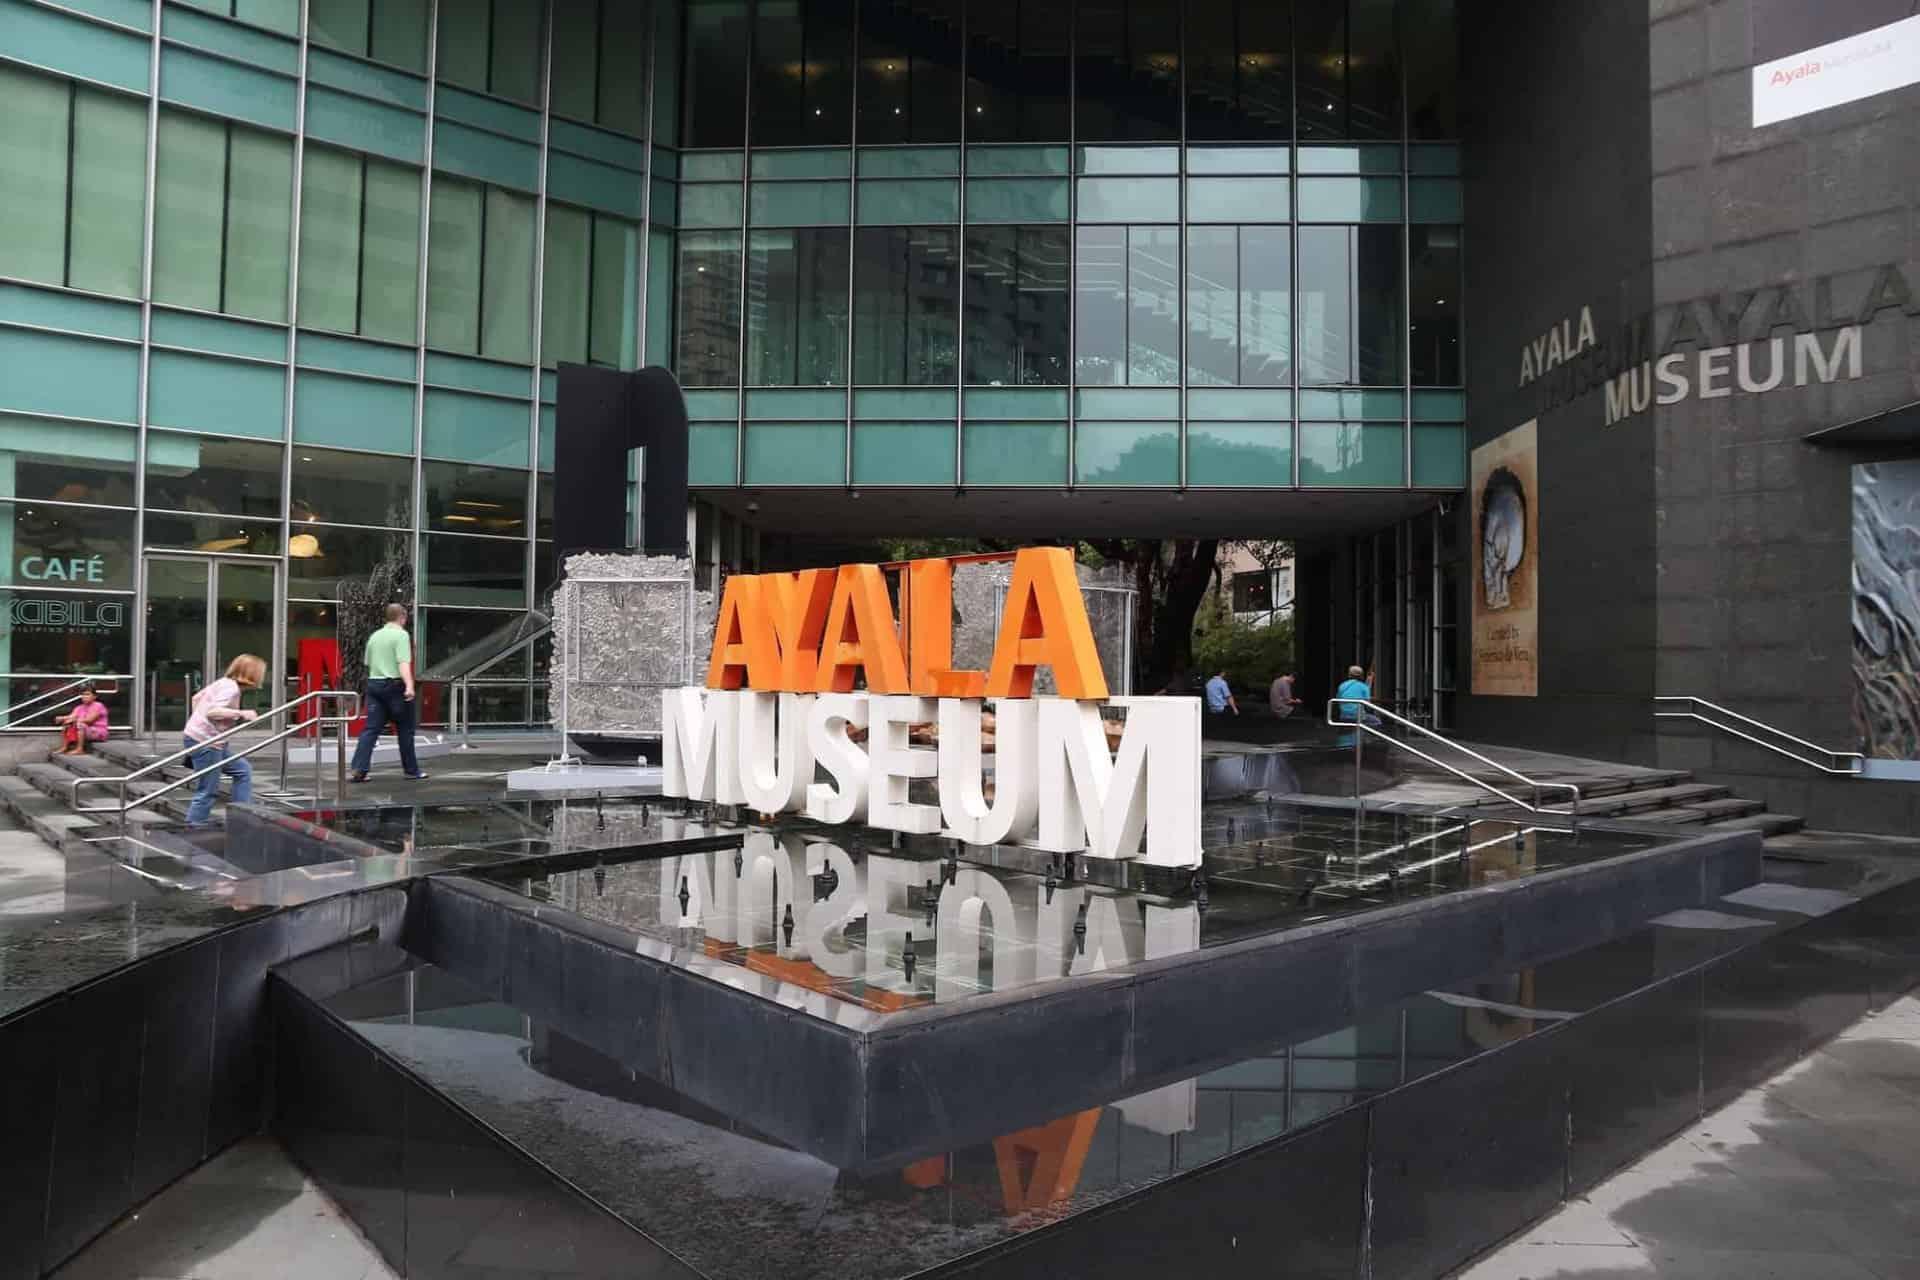 Ayala-Museum